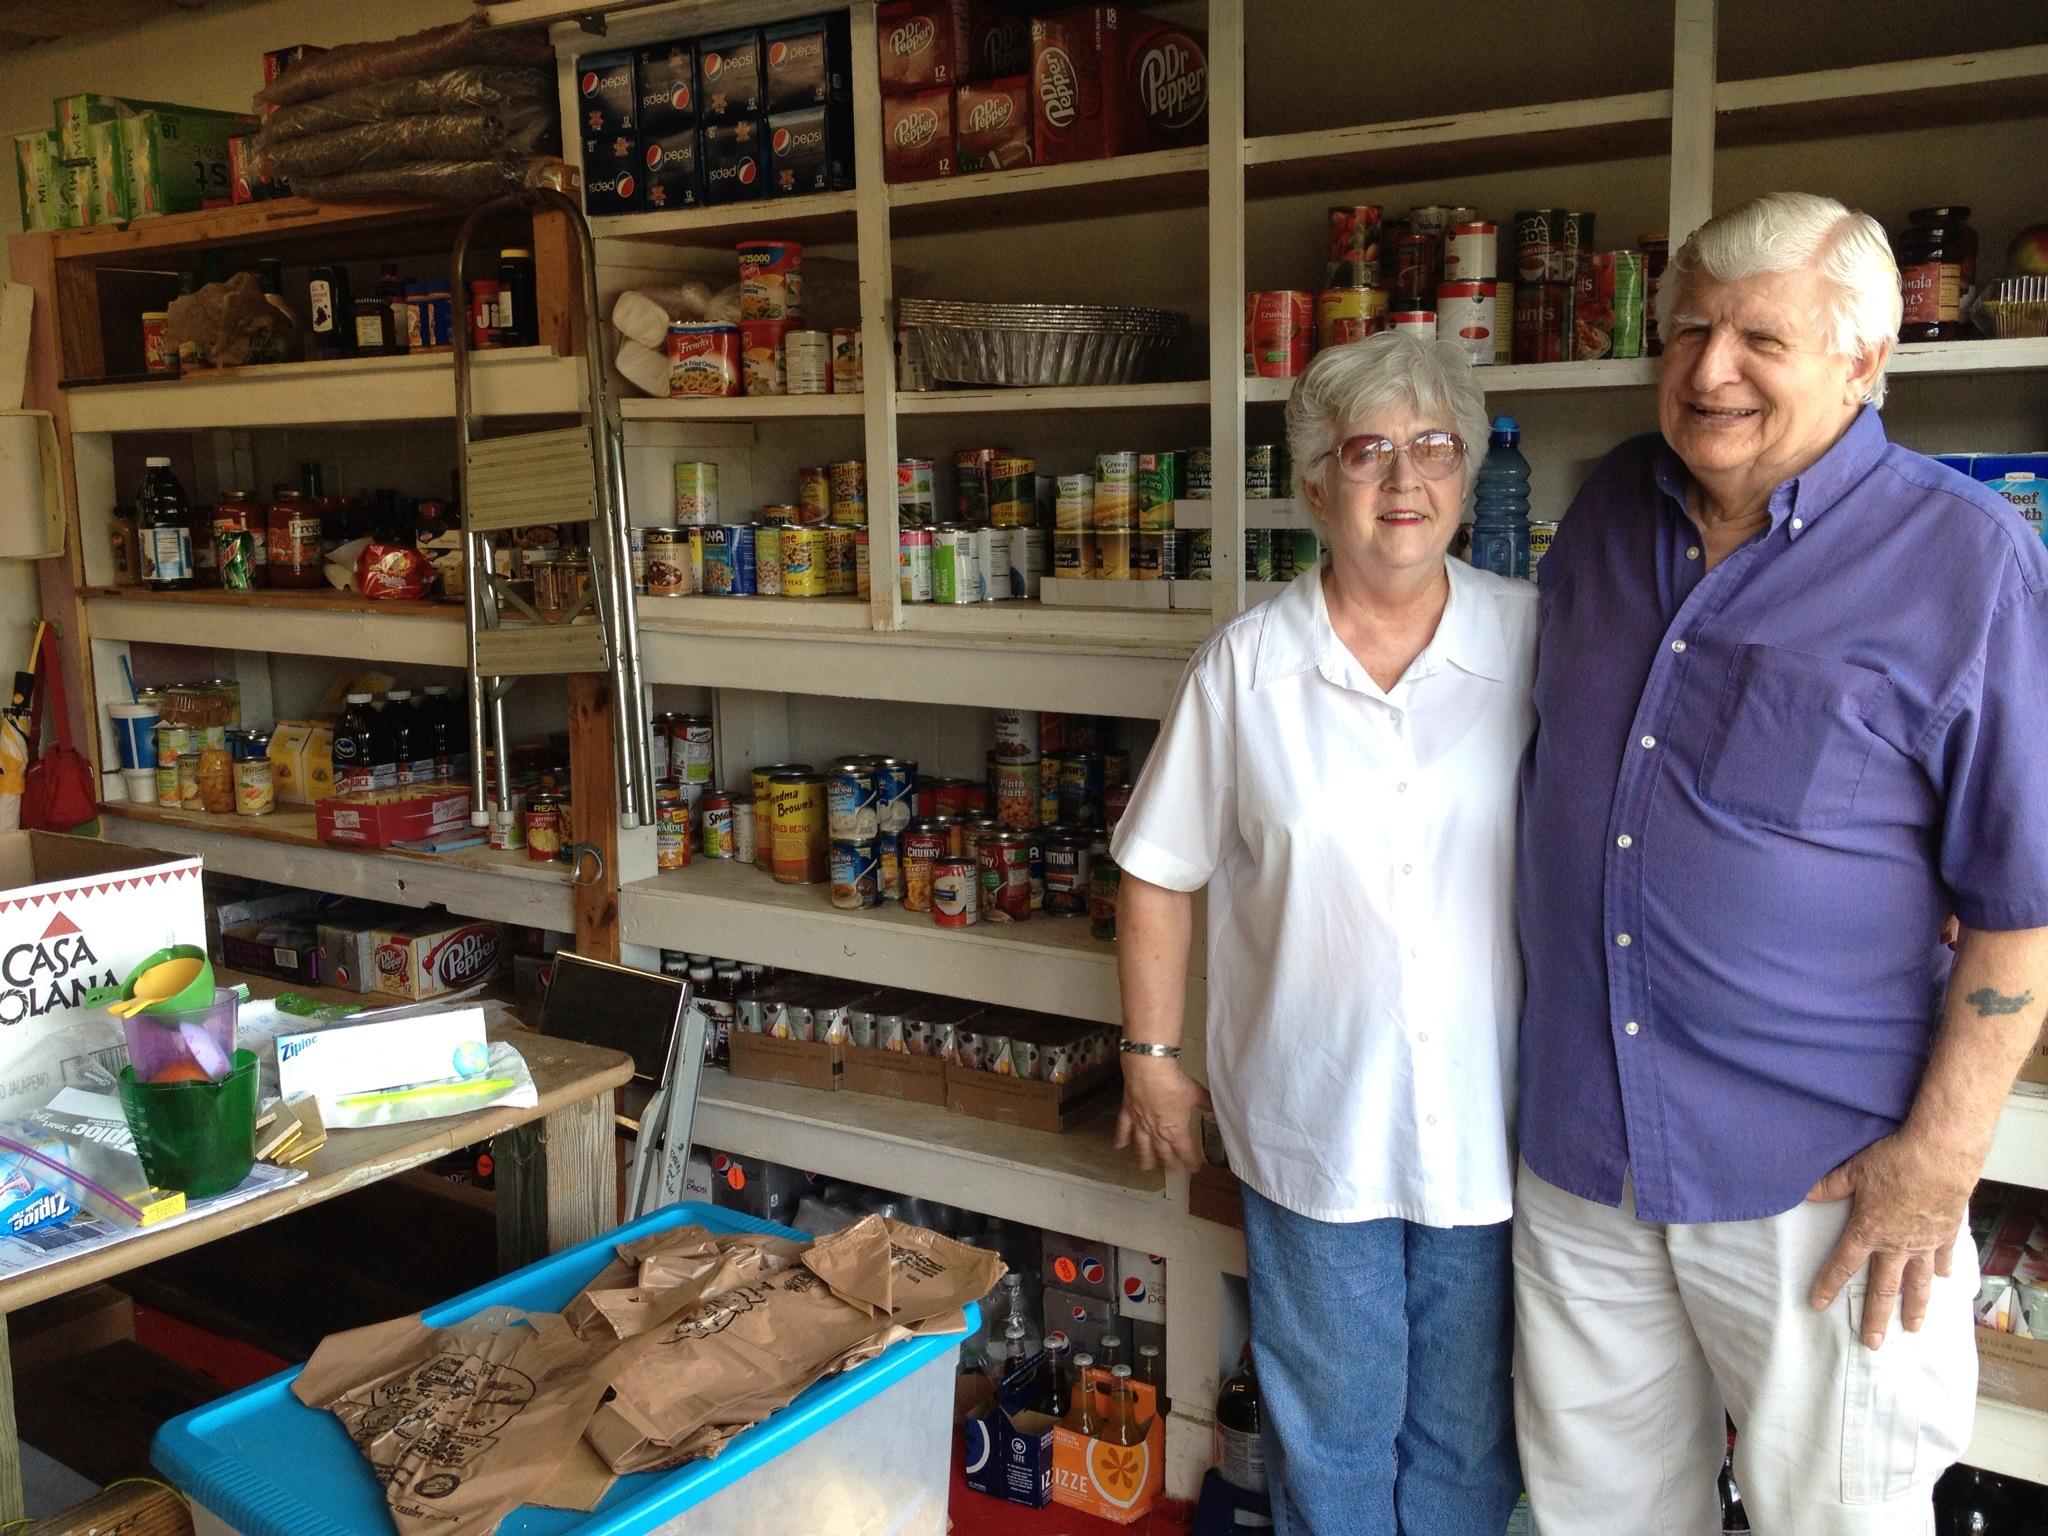 St Petersburg Food Pantry Donations